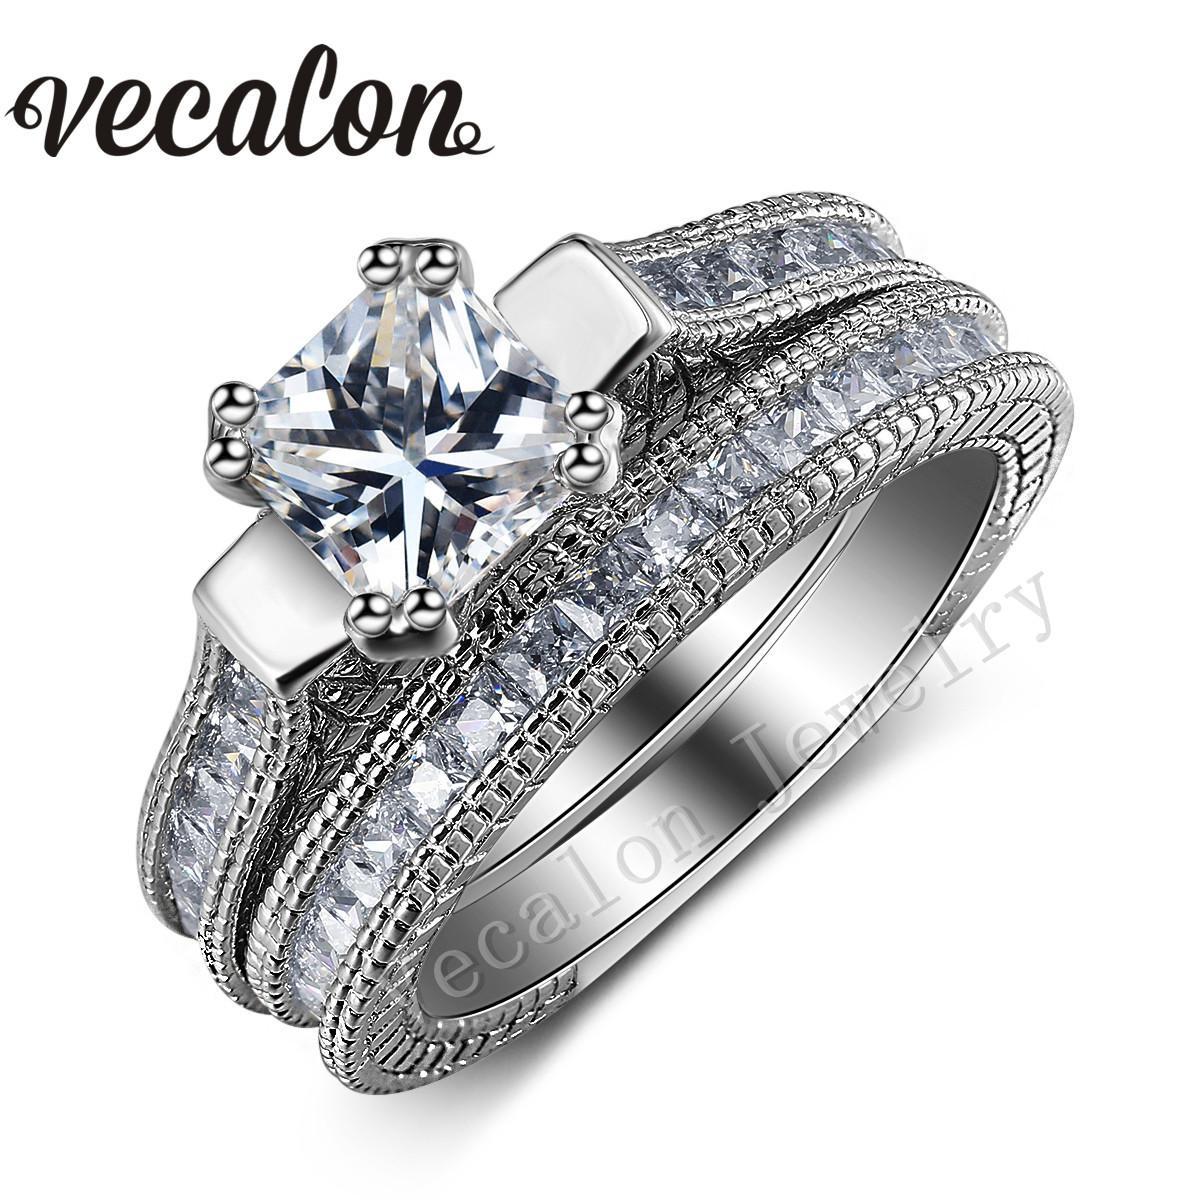 50 - Womens Wedding Ring Set